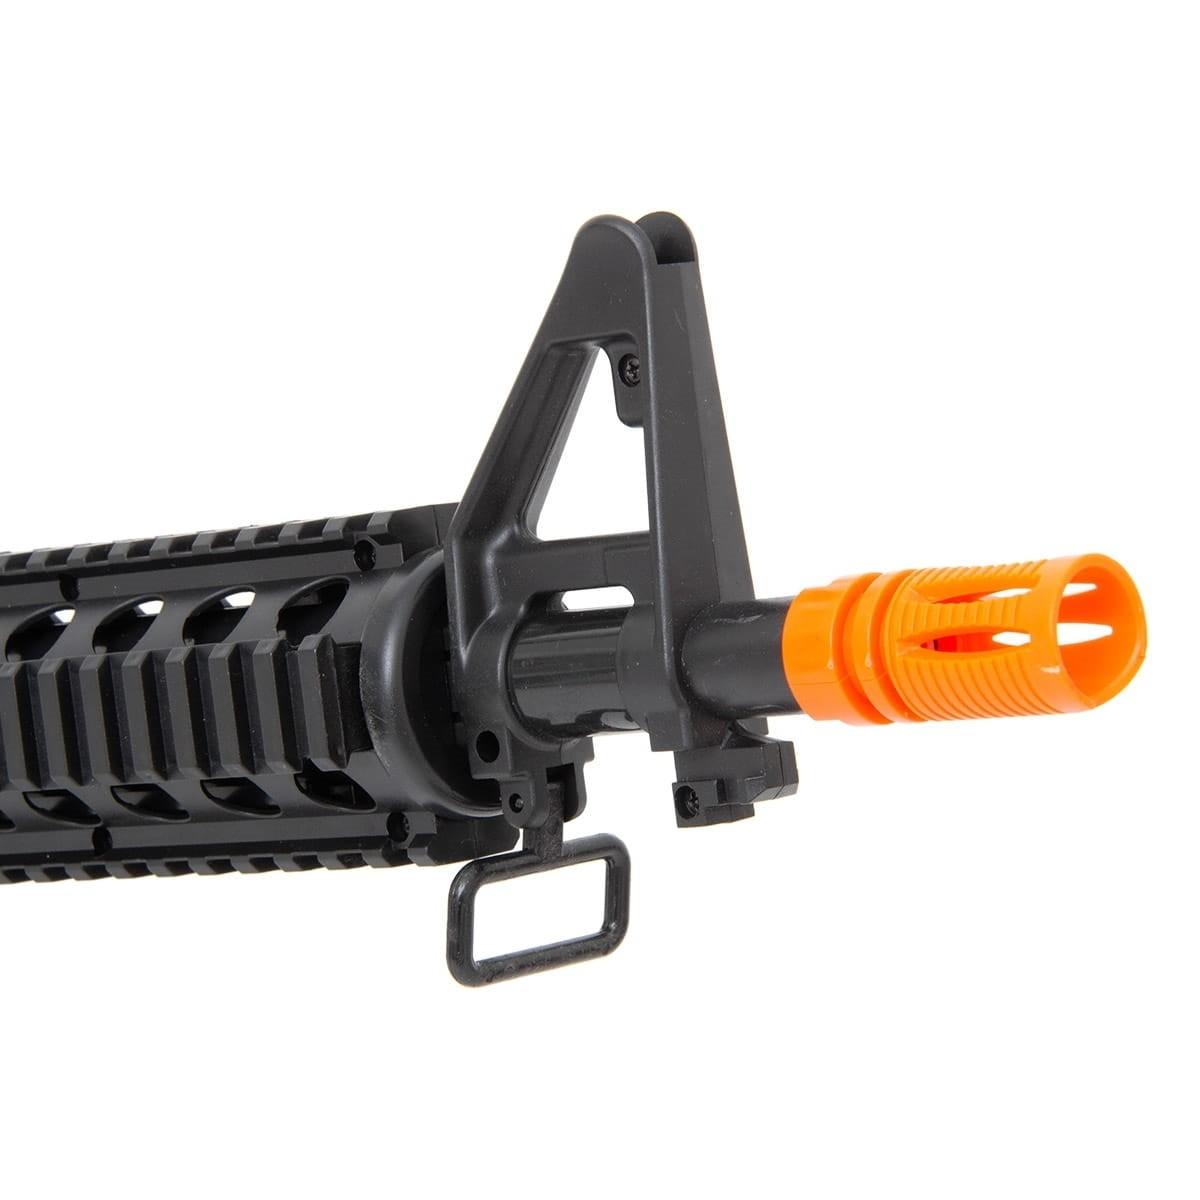 Rifle Airsoft Spring VG M4 RIS-CQB-8907 Mola